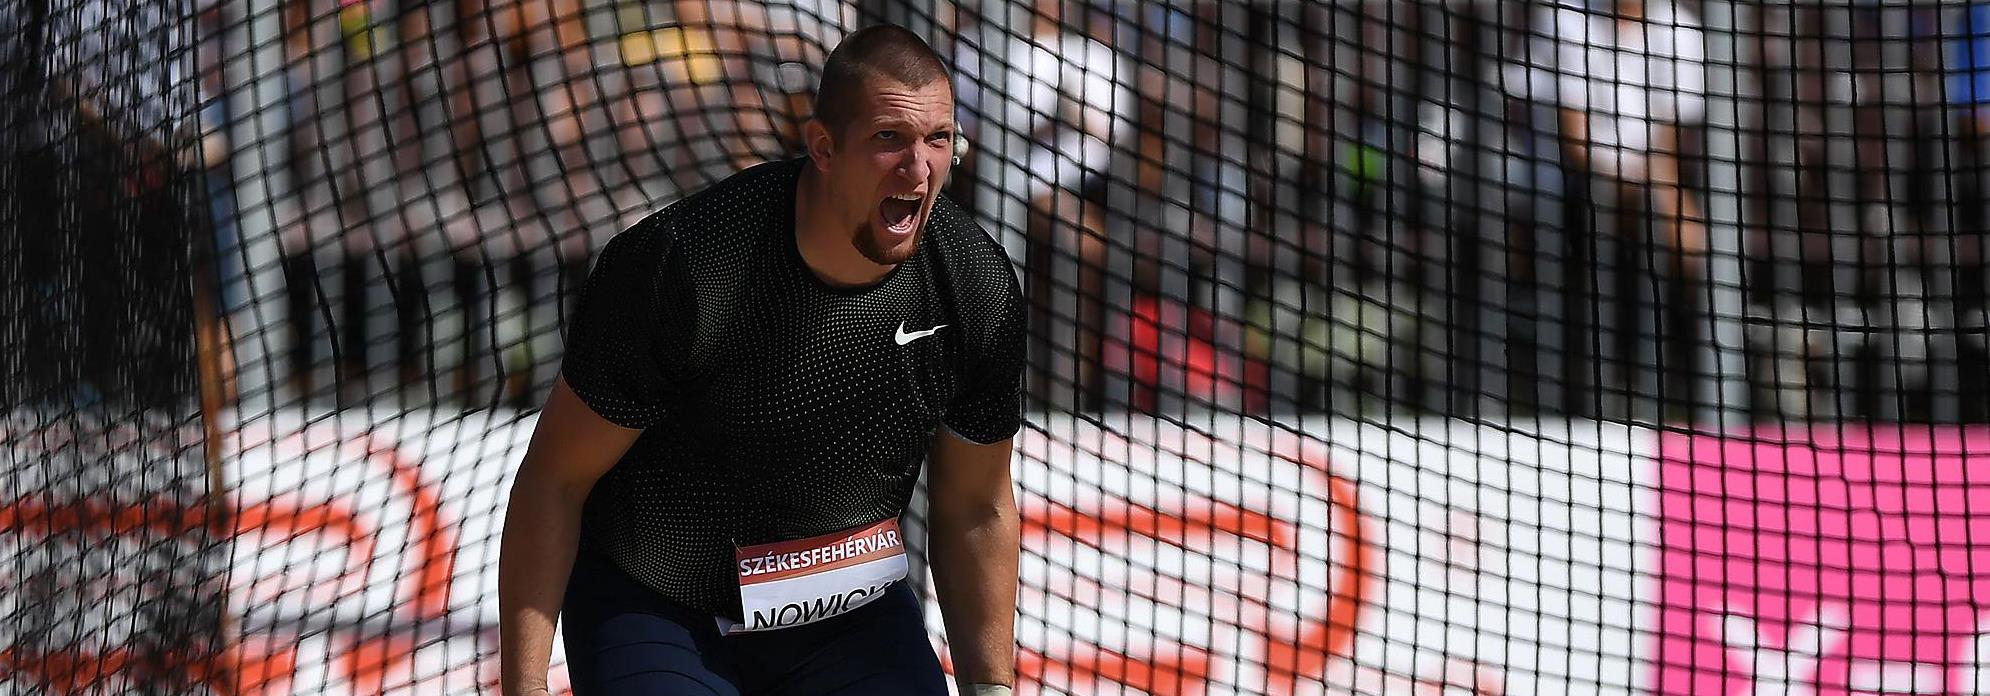 Polish hammer thrower Wojciech Nowicki (AFP / Getty Images)